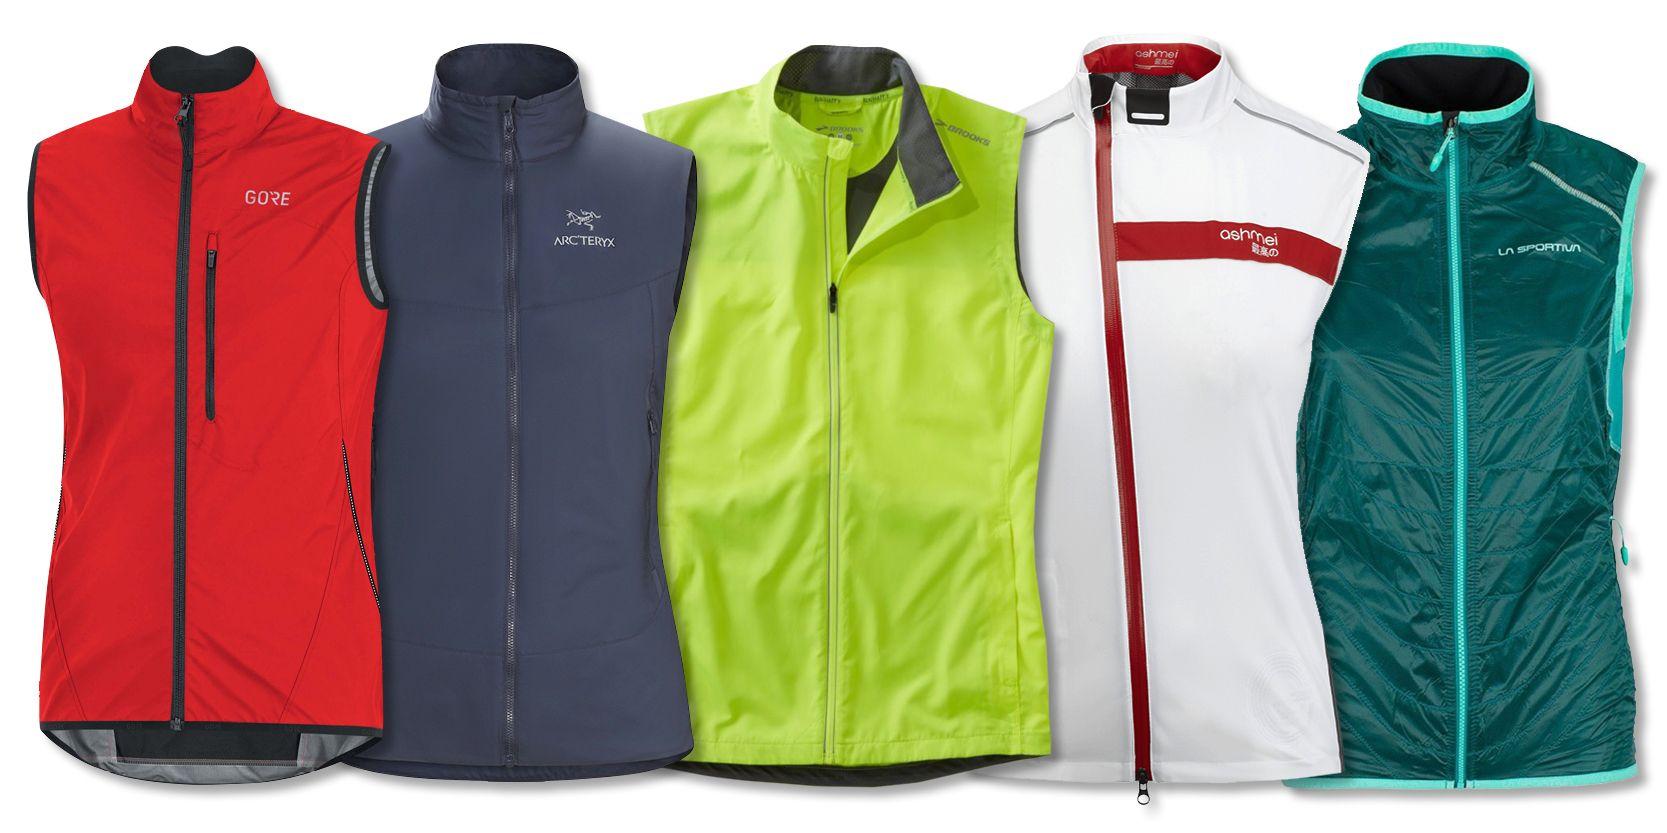 The 10 Best Vests for Spring Running